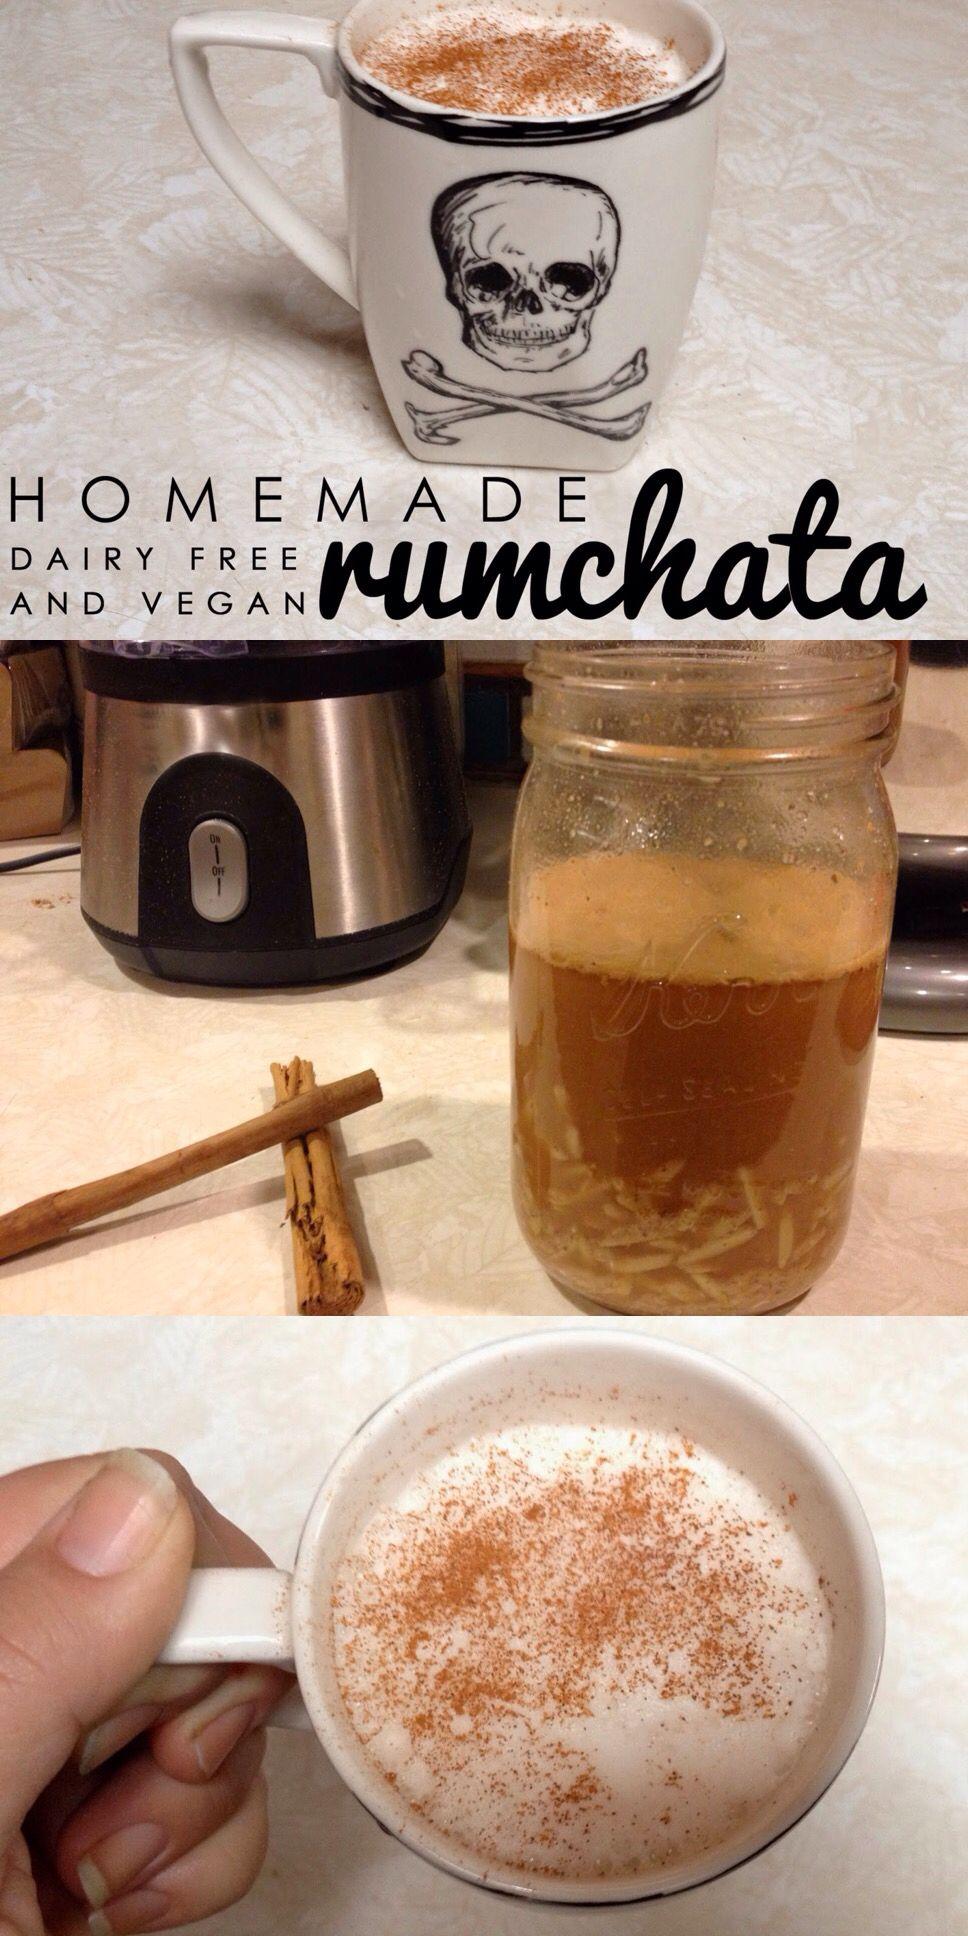 Homemade Rumchata Recipe, Vegan and Dairy-free  Rumchata is a great